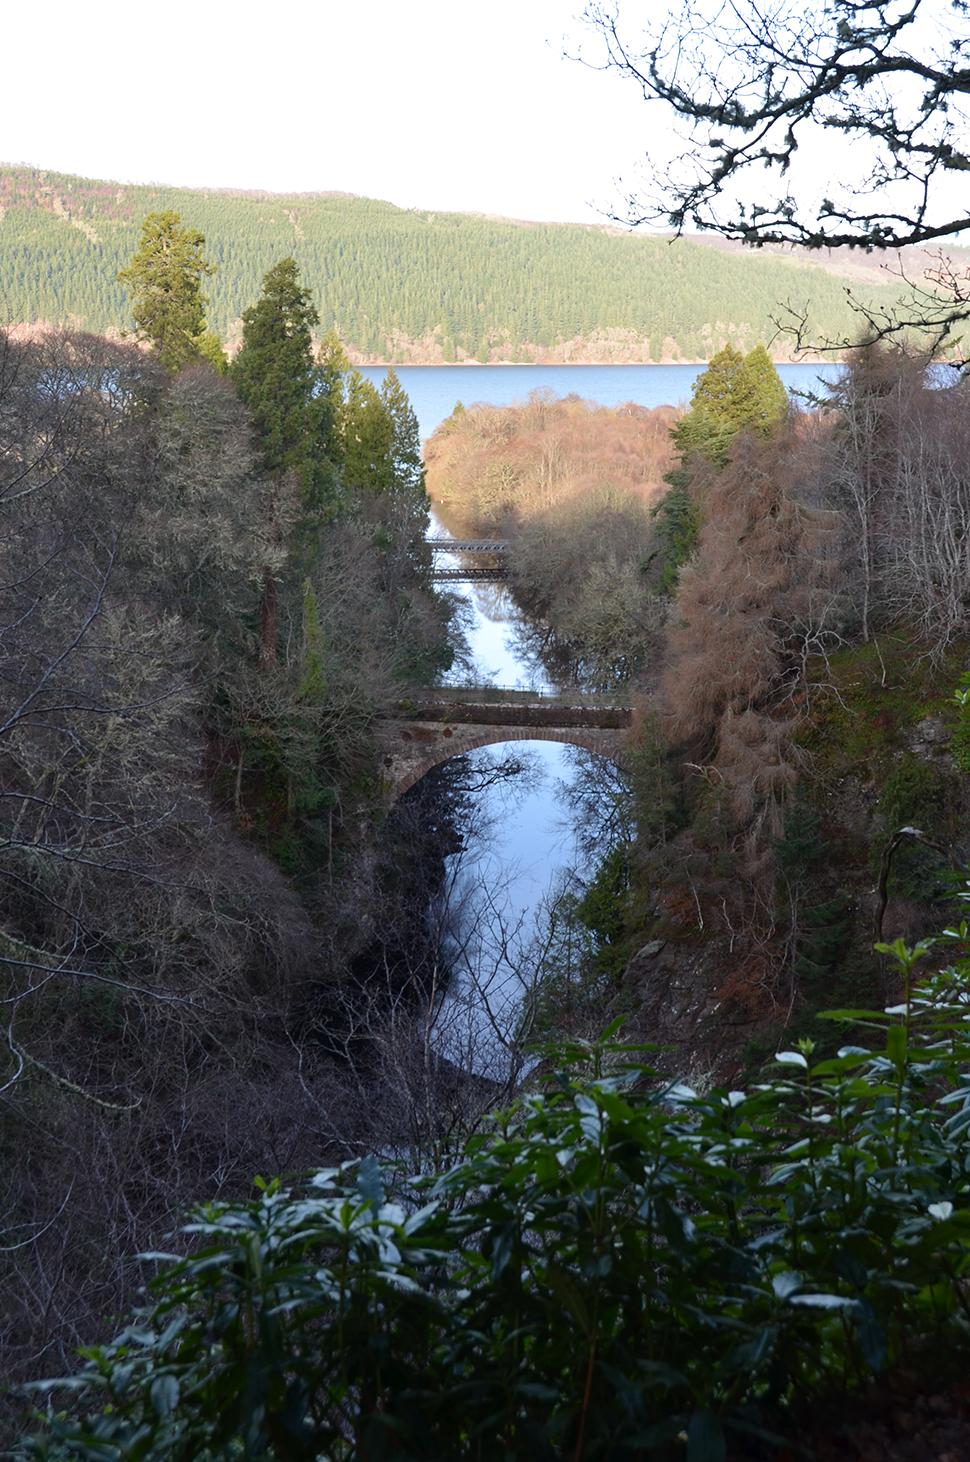 Helloitsvalentine_Ecosse_Inverness_56